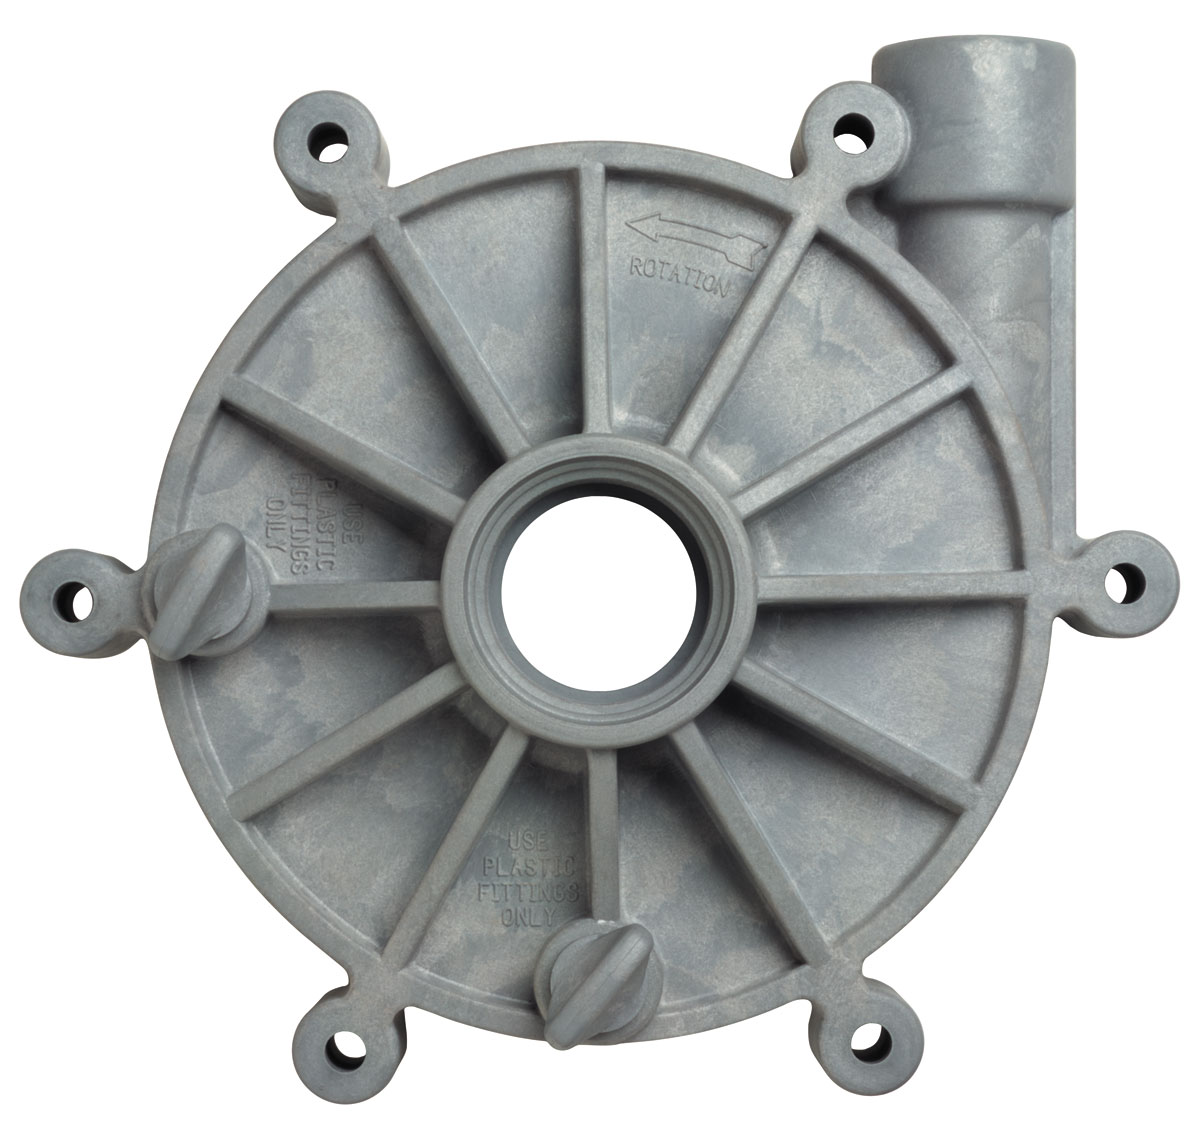 Advance 3000 Pump Volute